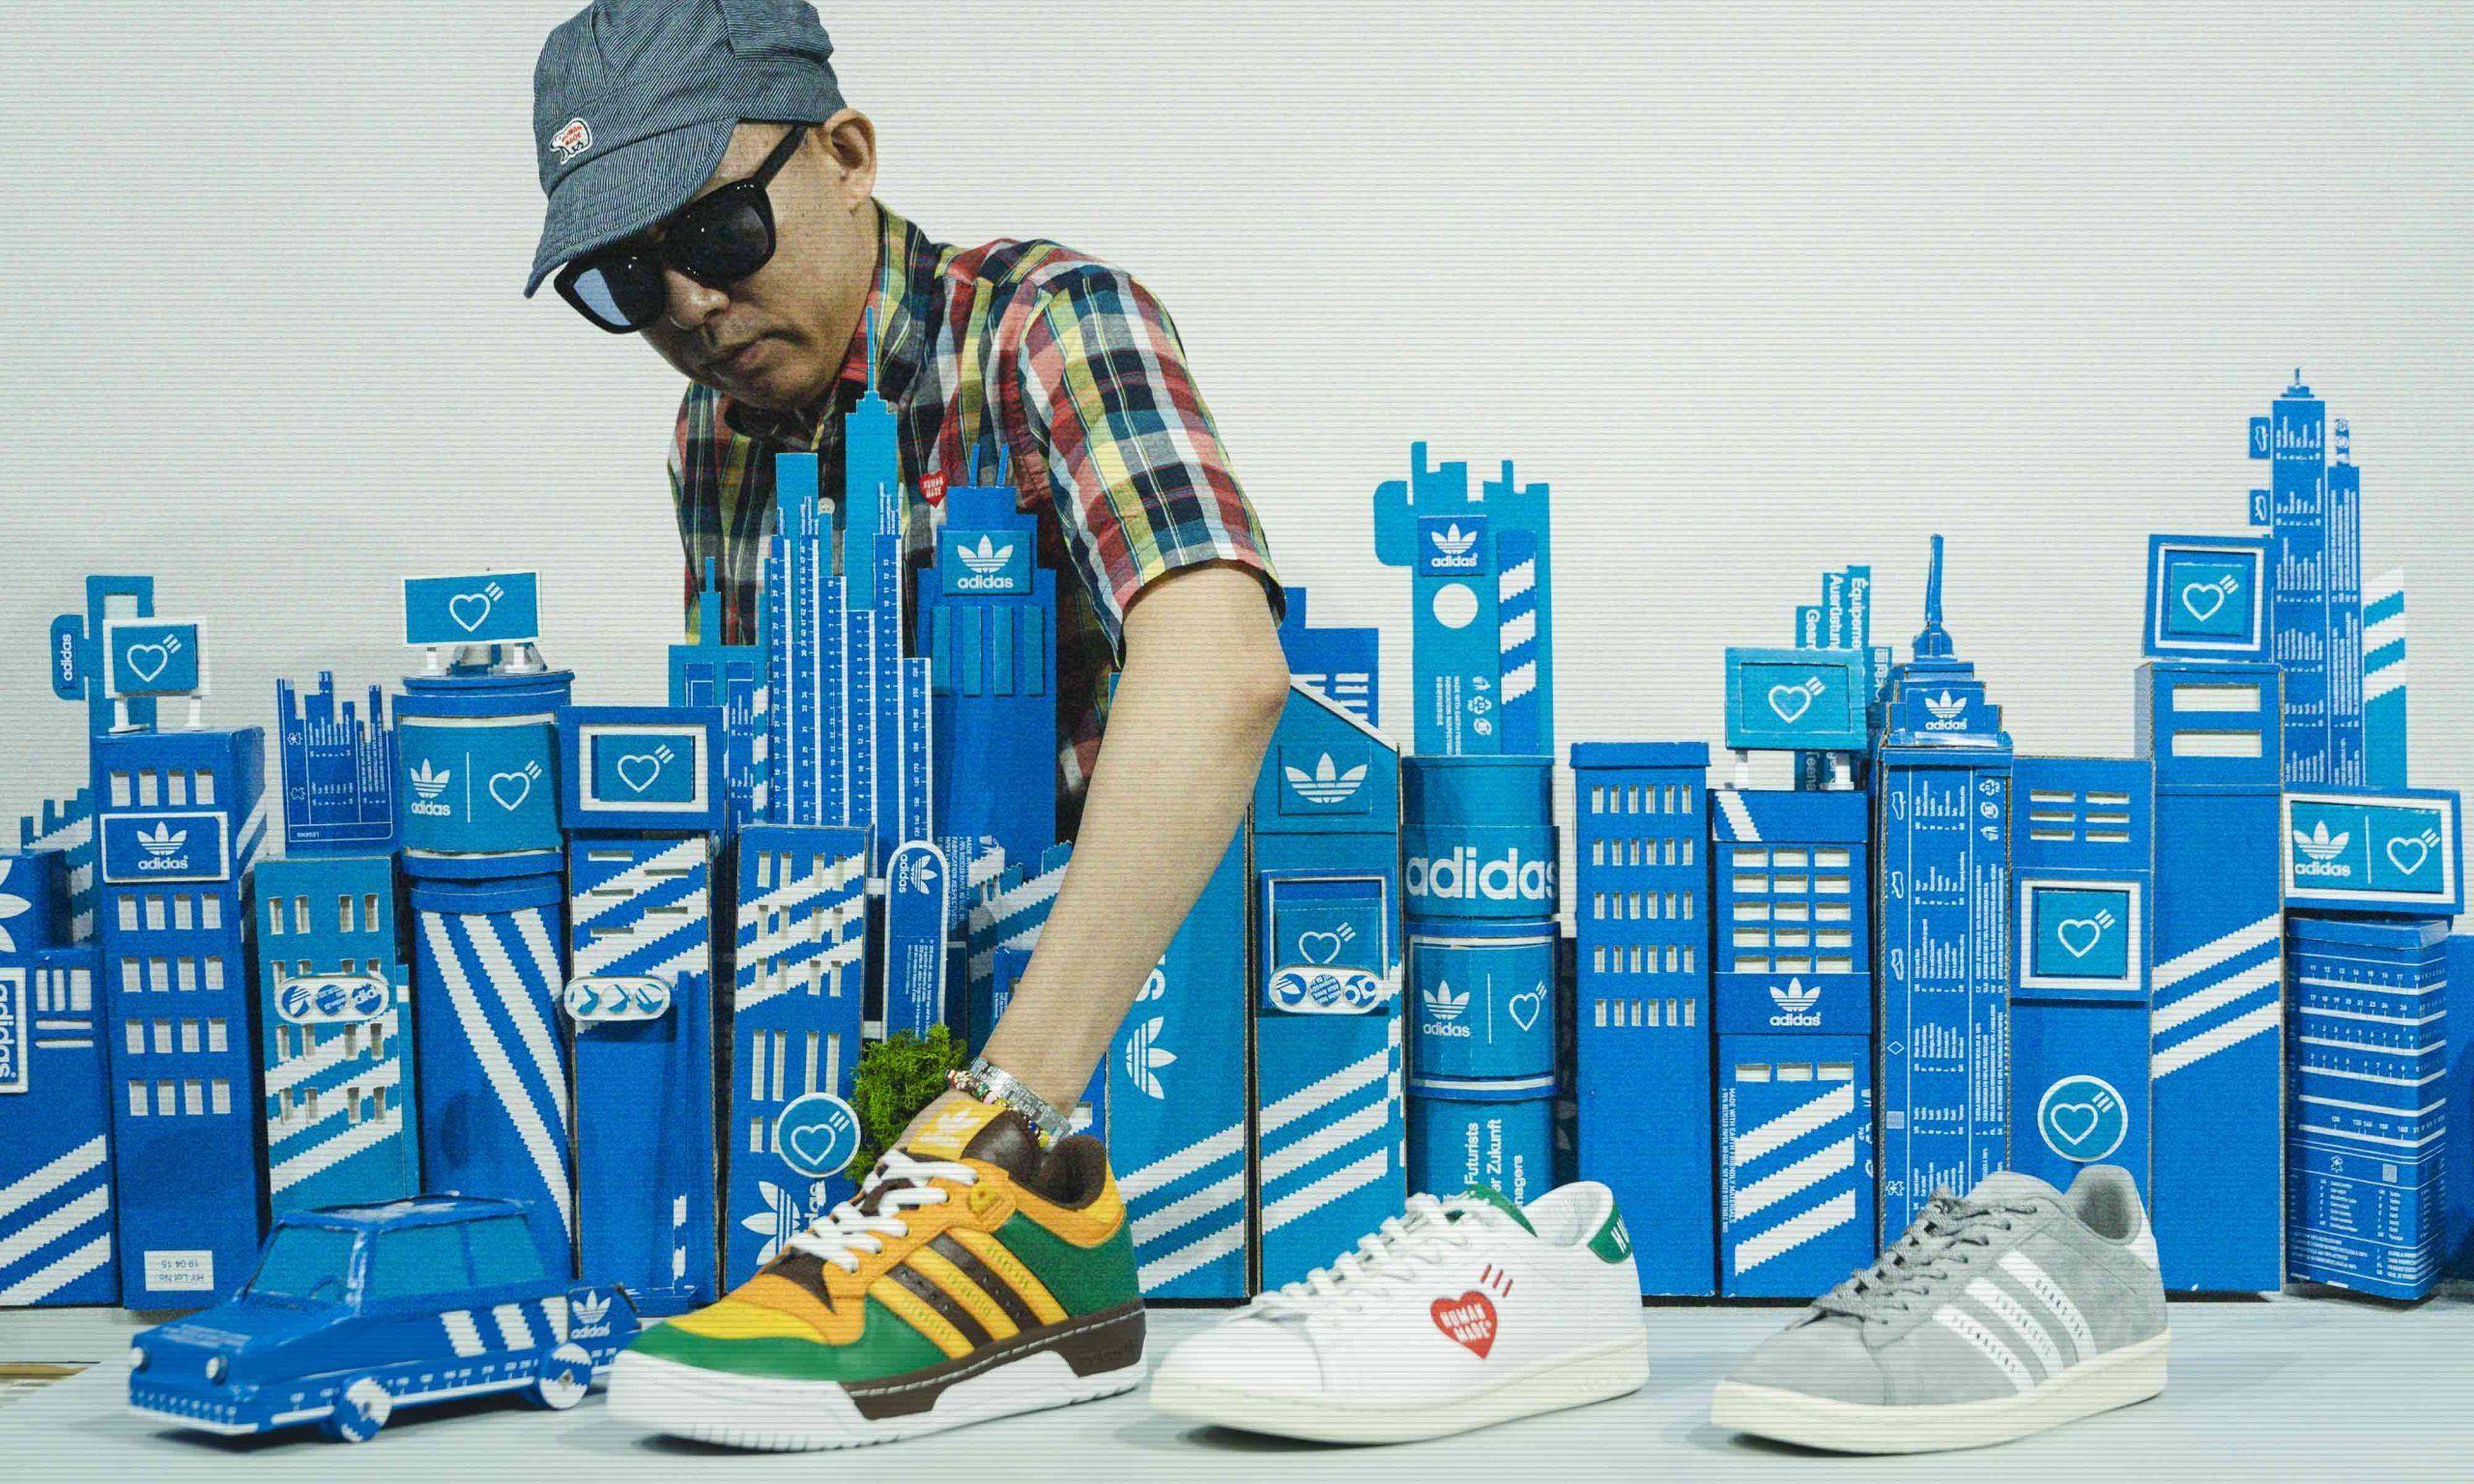 2020 春夏最终章,HUMAN MADE x adidas Originals 重塑经典